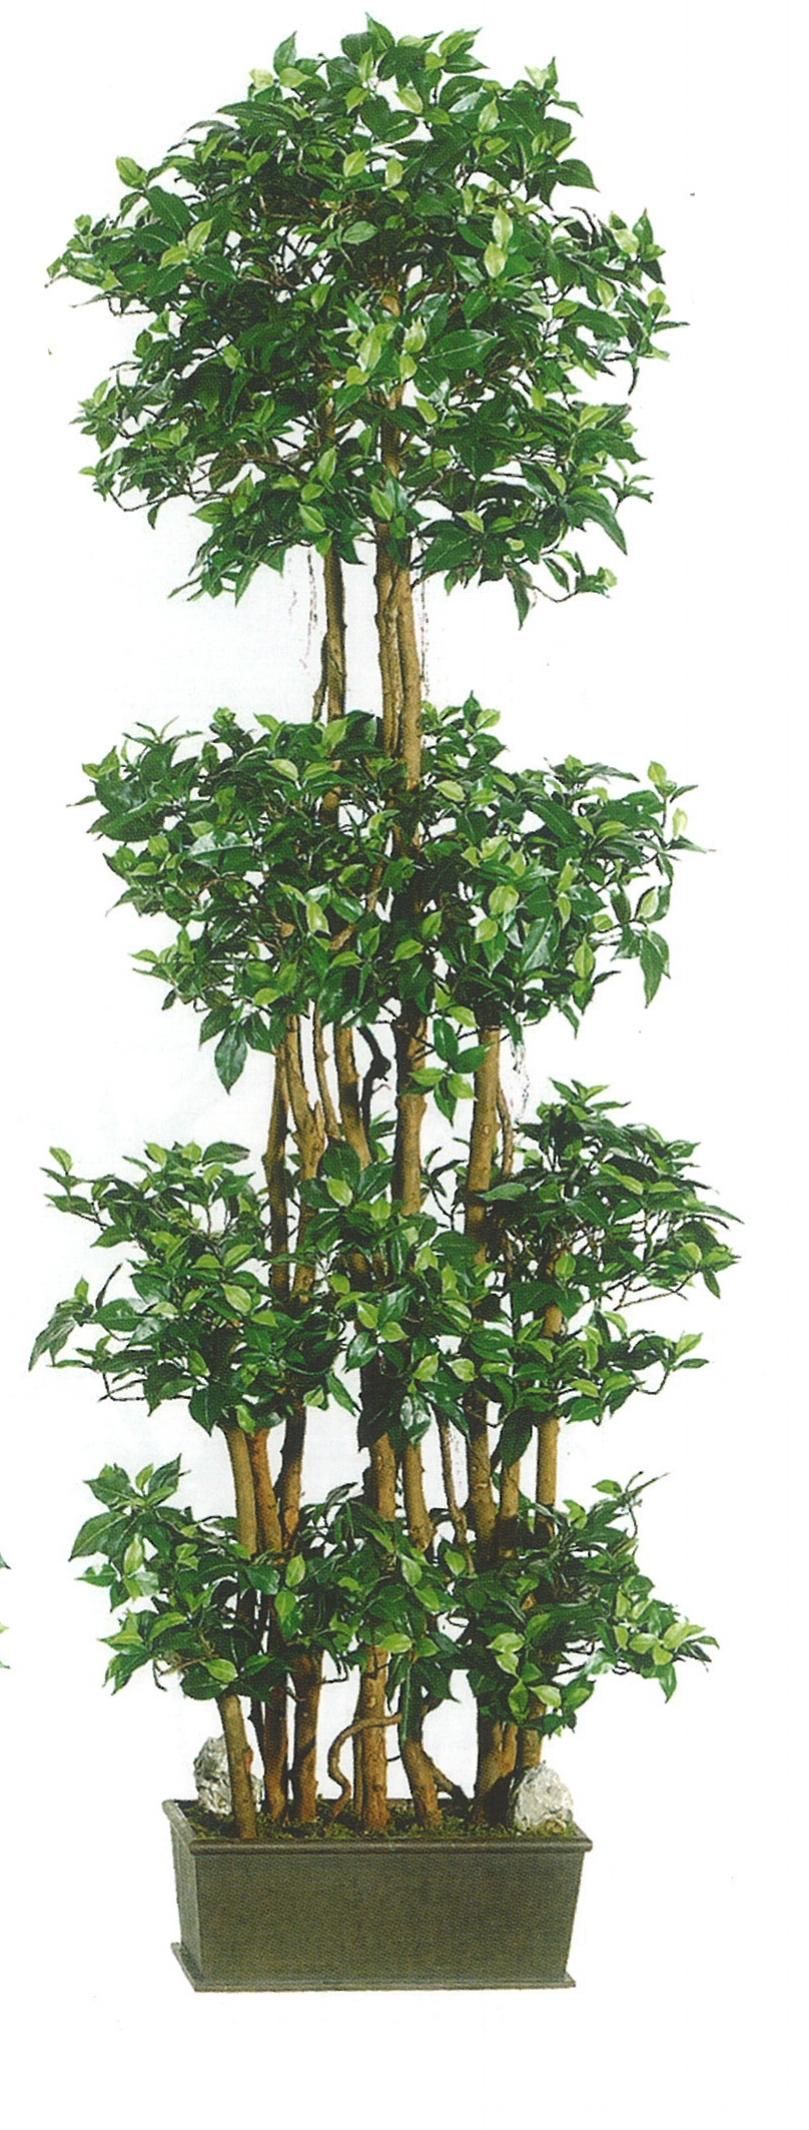 TSP 4524- Ficus panel tree